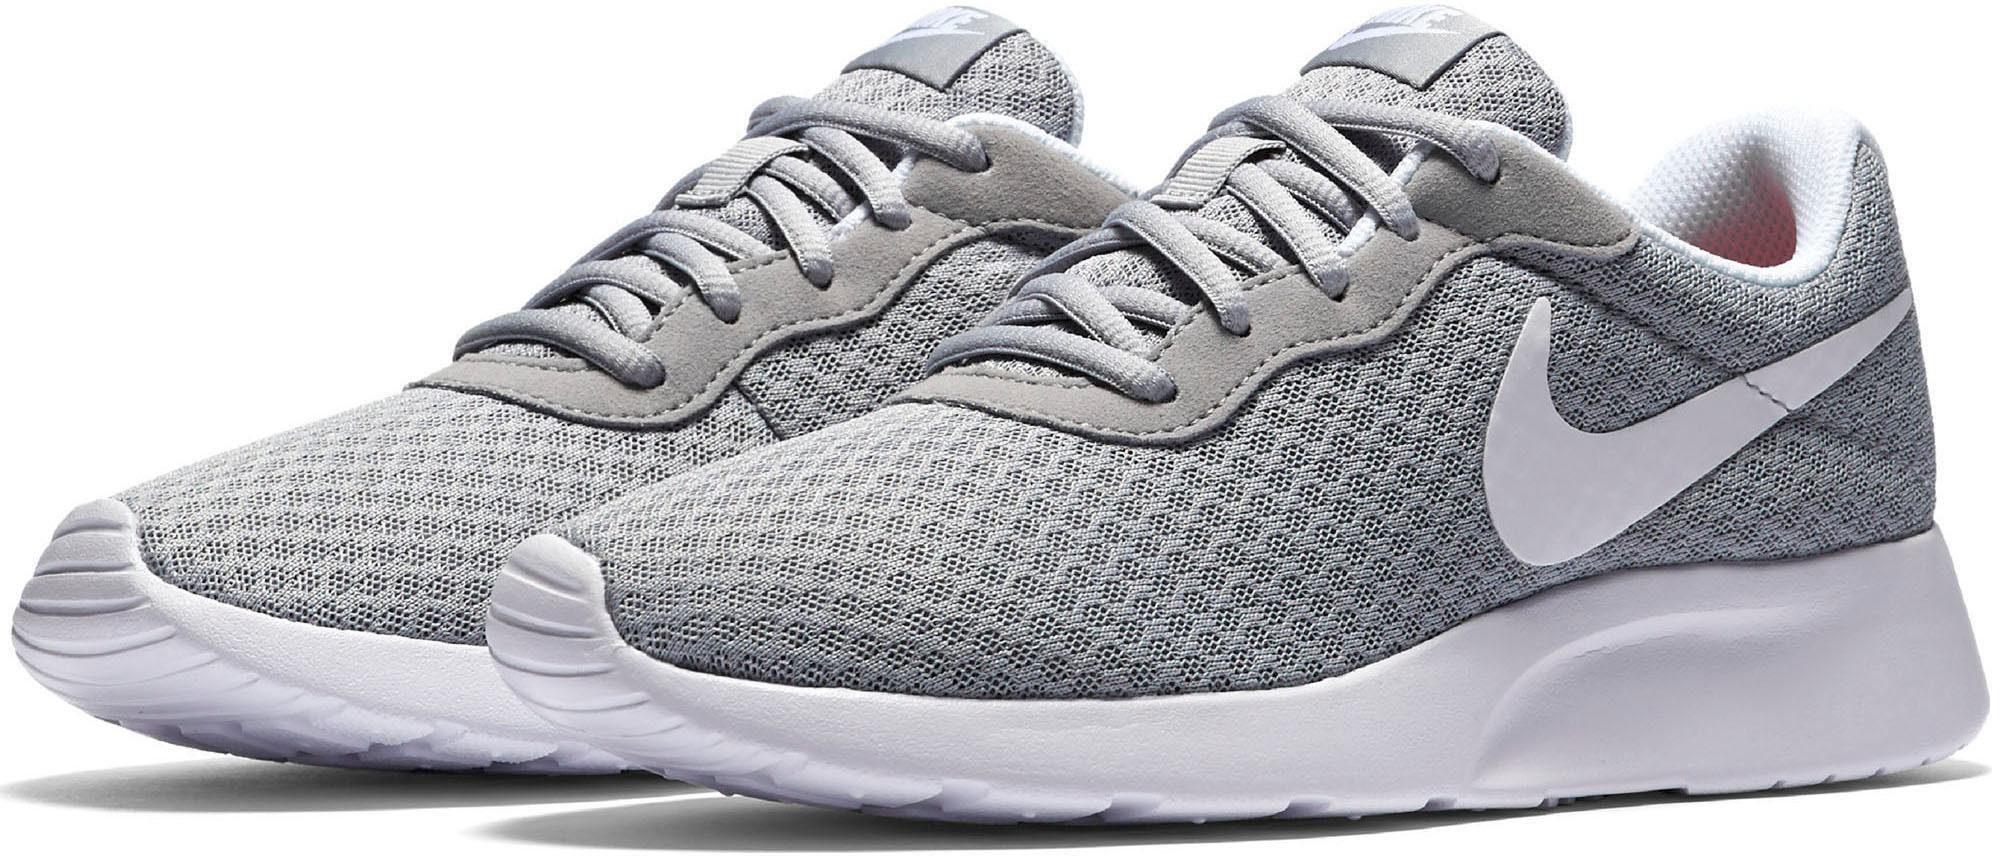 Obermaterial Sportswear Textil »Tanjun SneakerStabiles Nike Wmns« online kaufenOTTO O8wymnvN0P